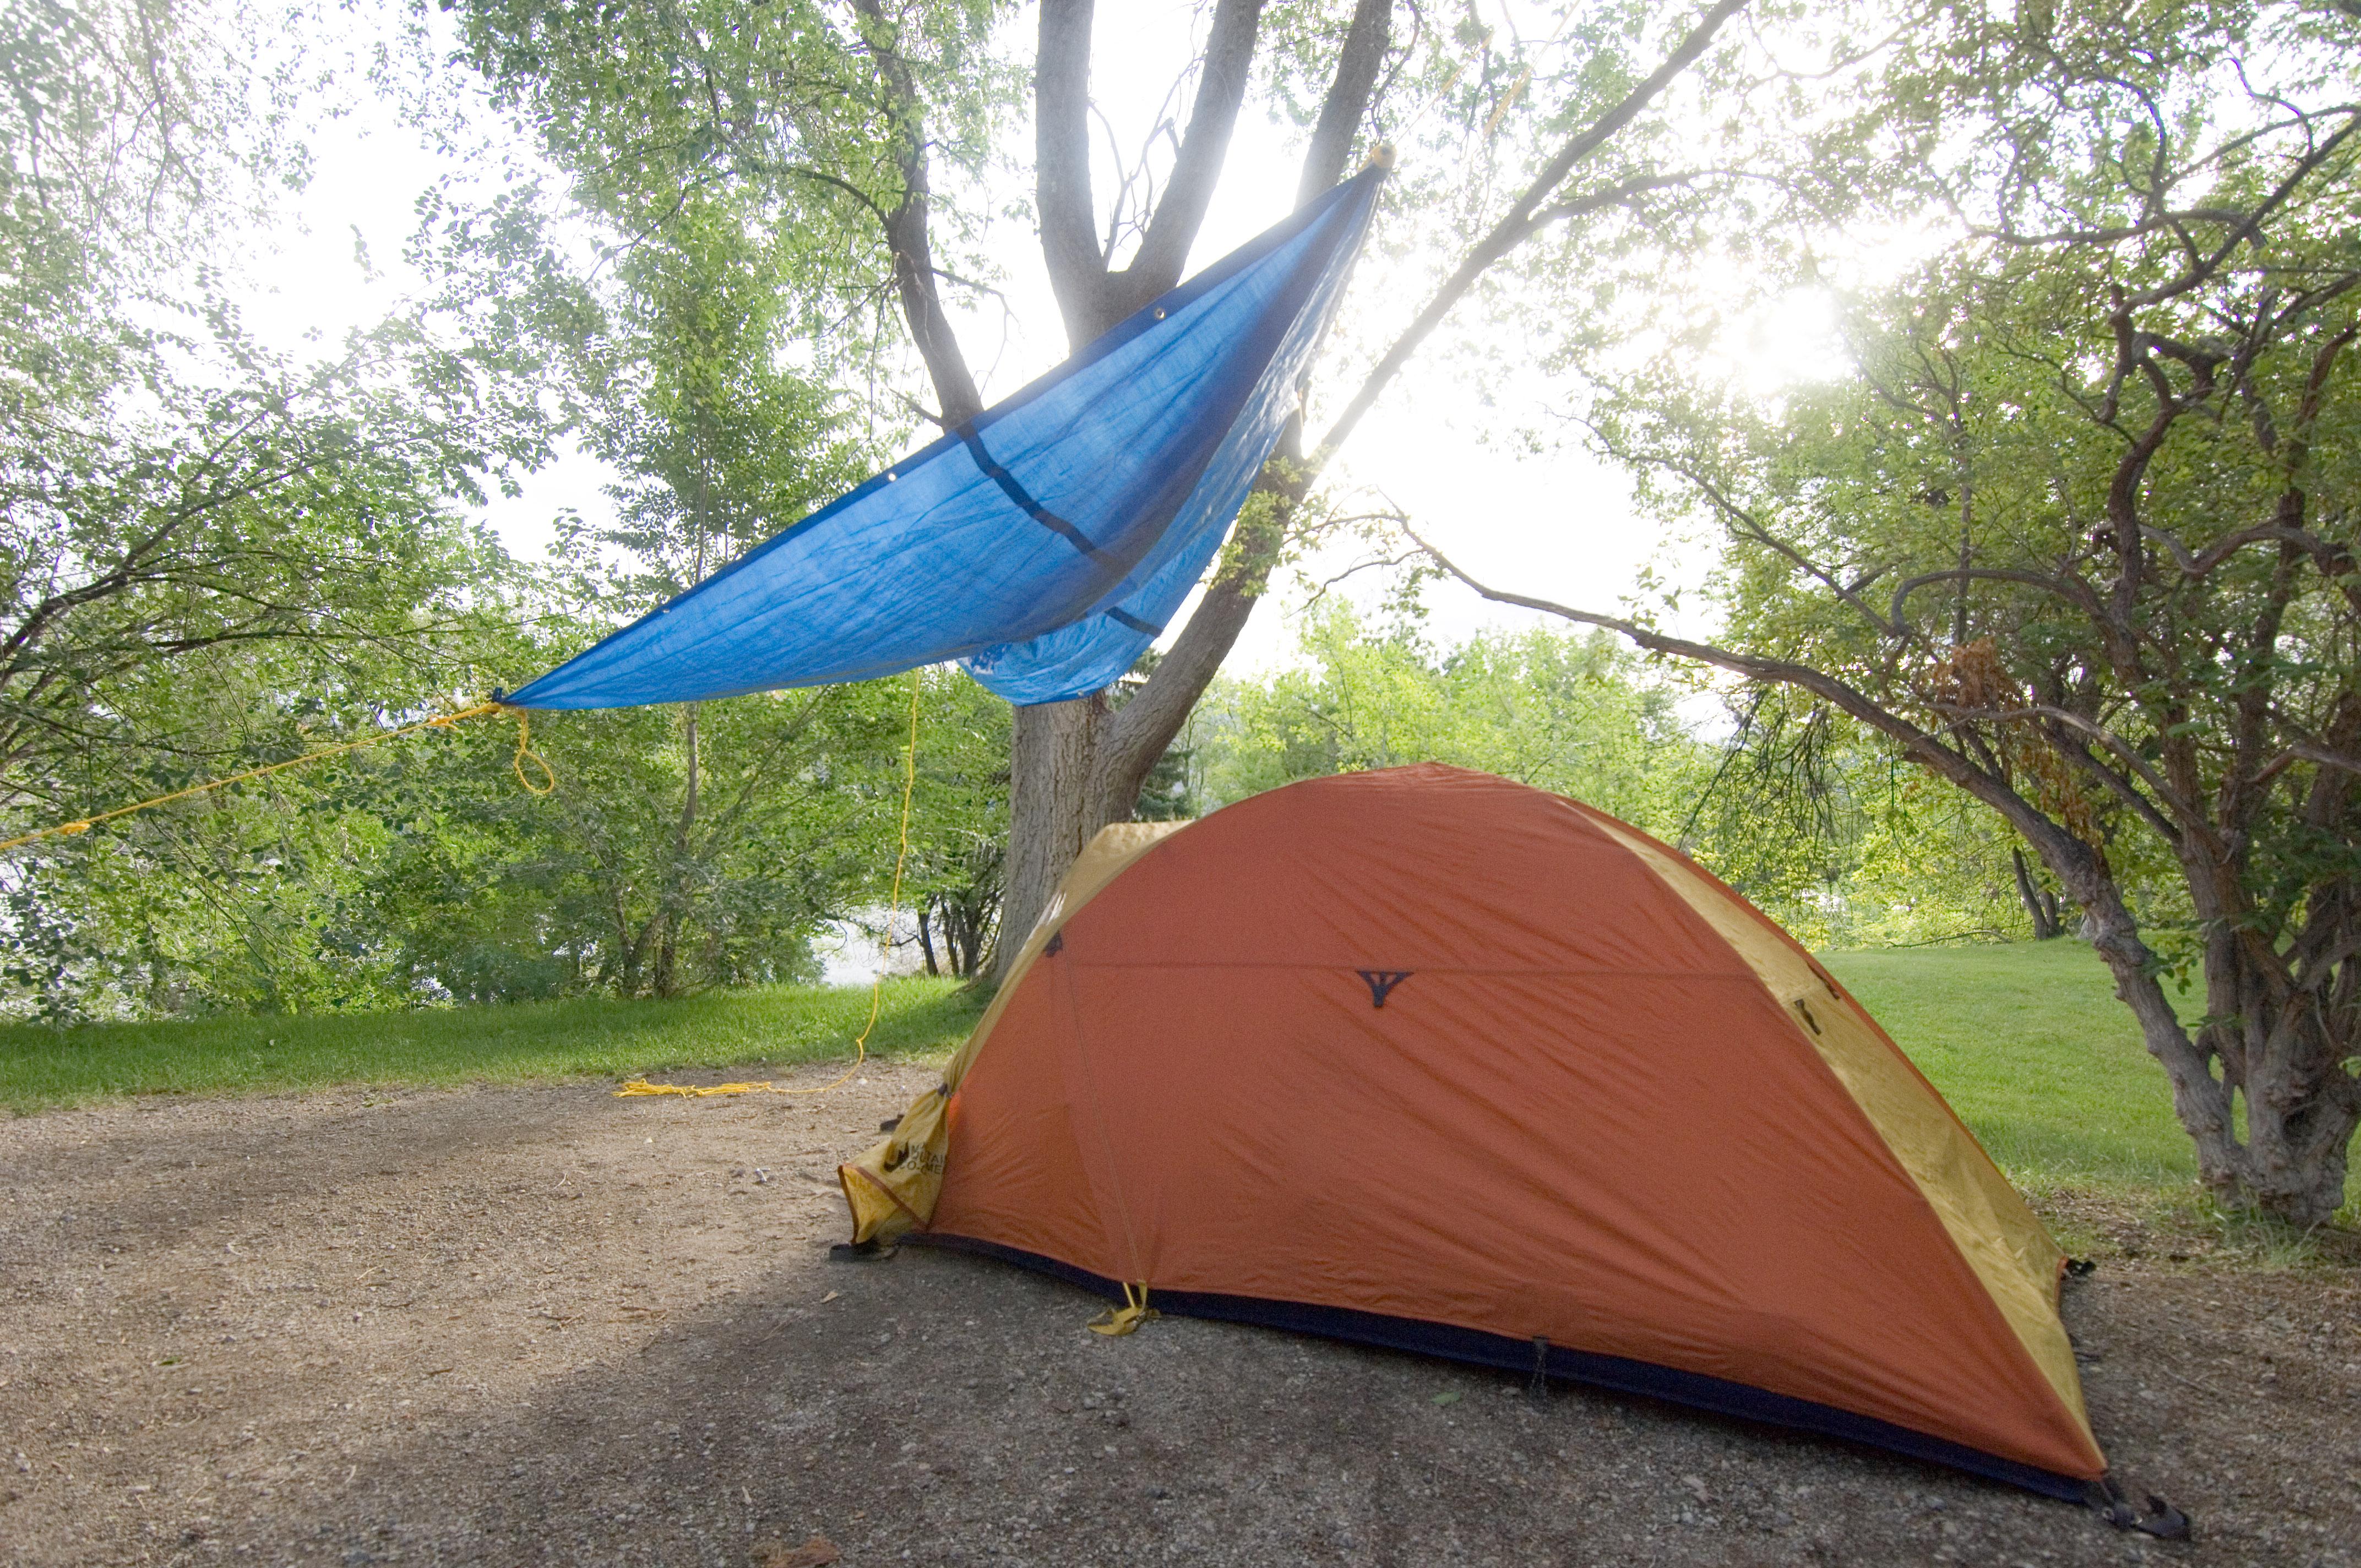 Tent With Tarp Over Entrance & Search John Harvey Photo...